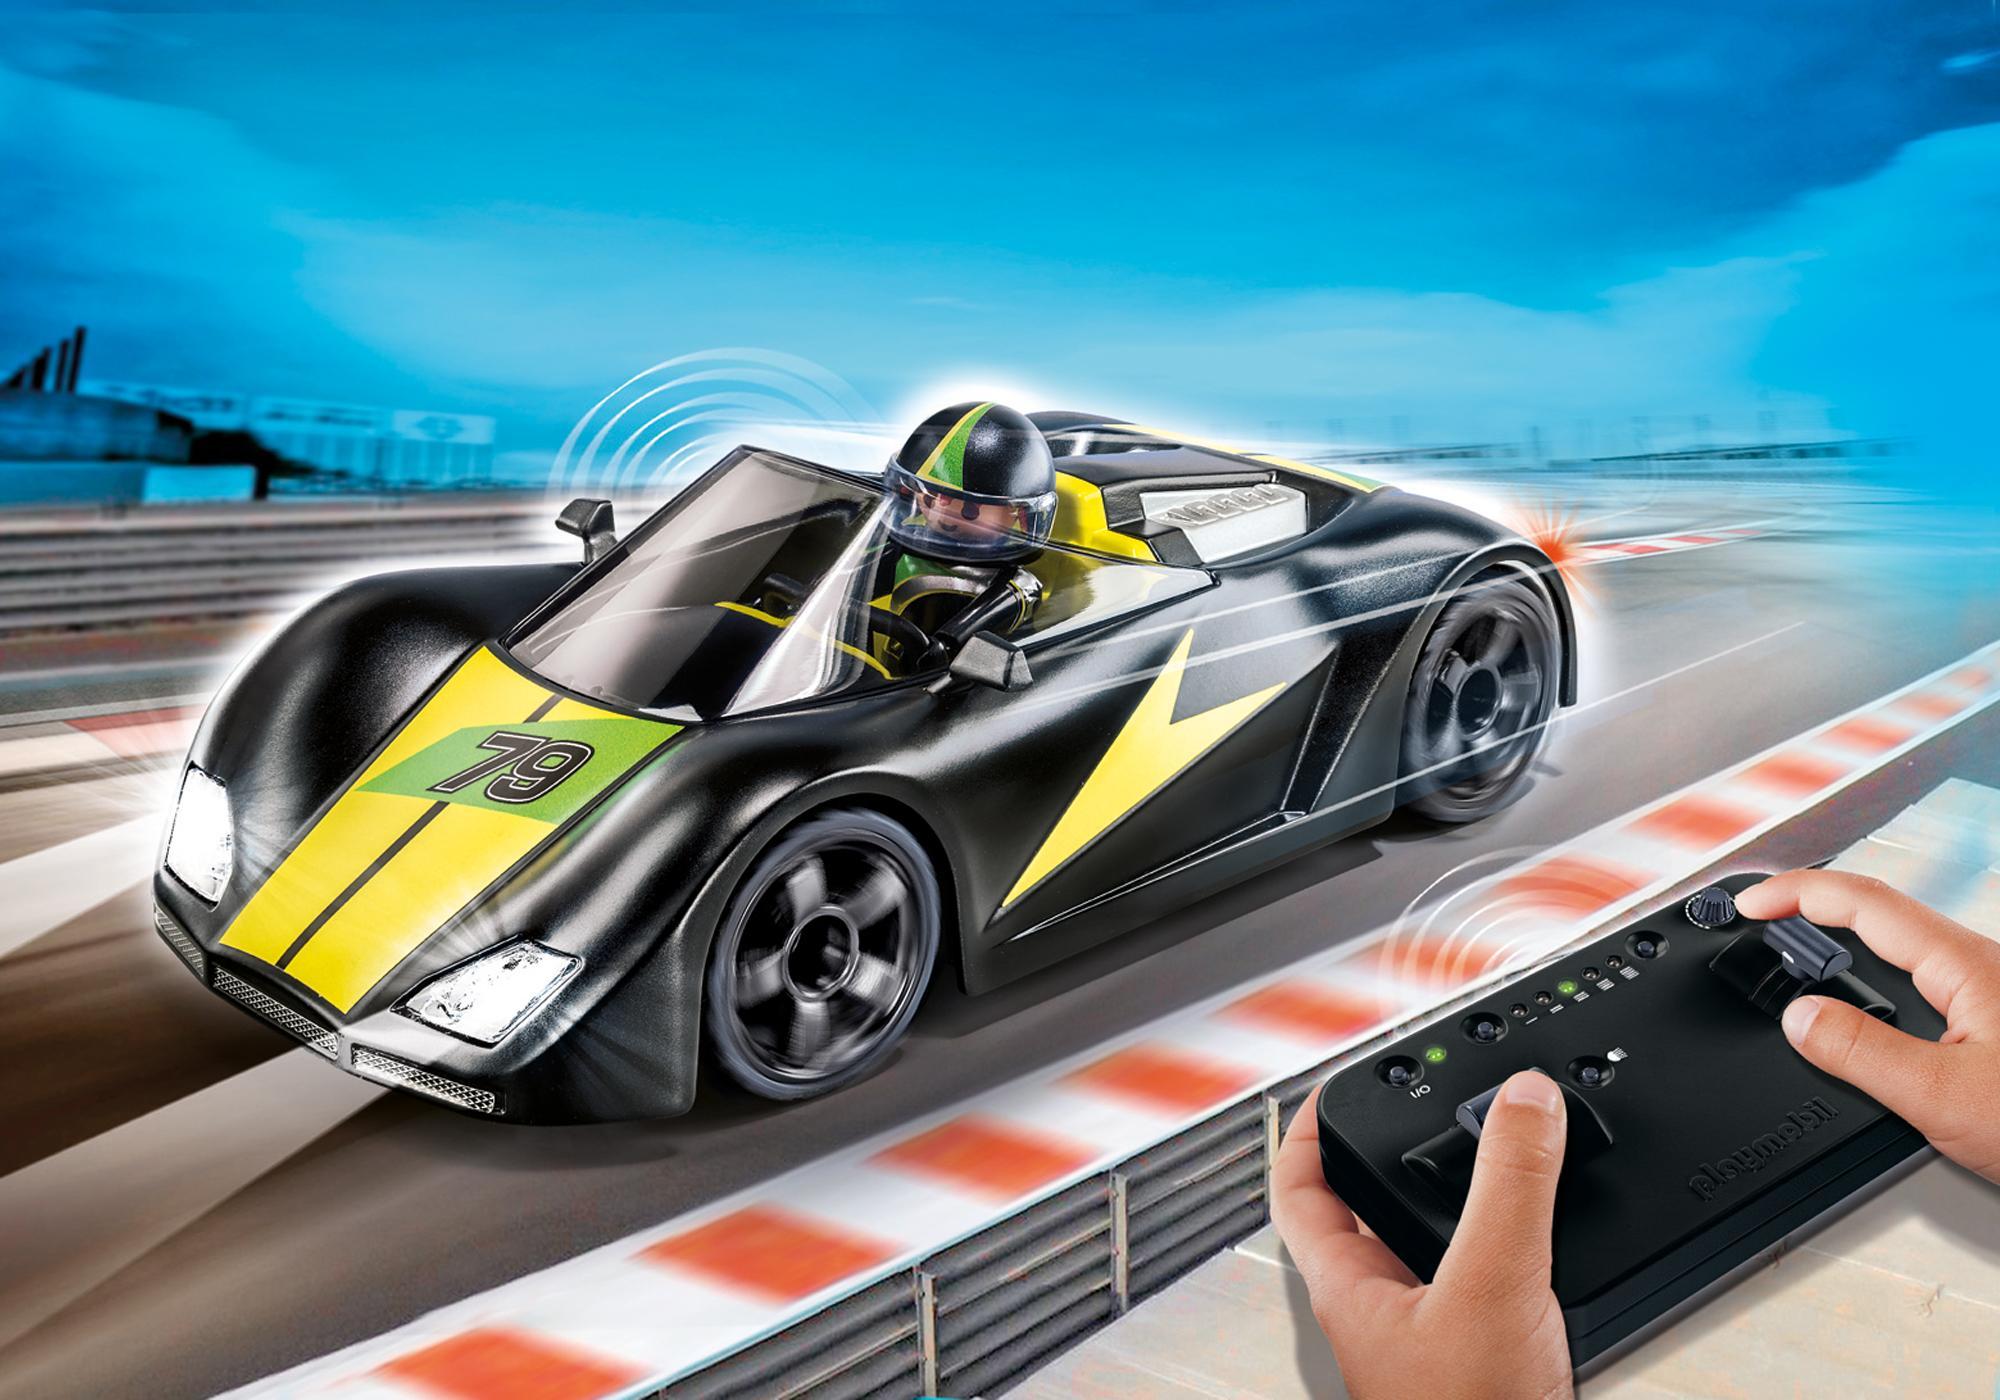 http://media.playmobil.com/i/playmobil/9089_product_detail/Racer Deportivo RC